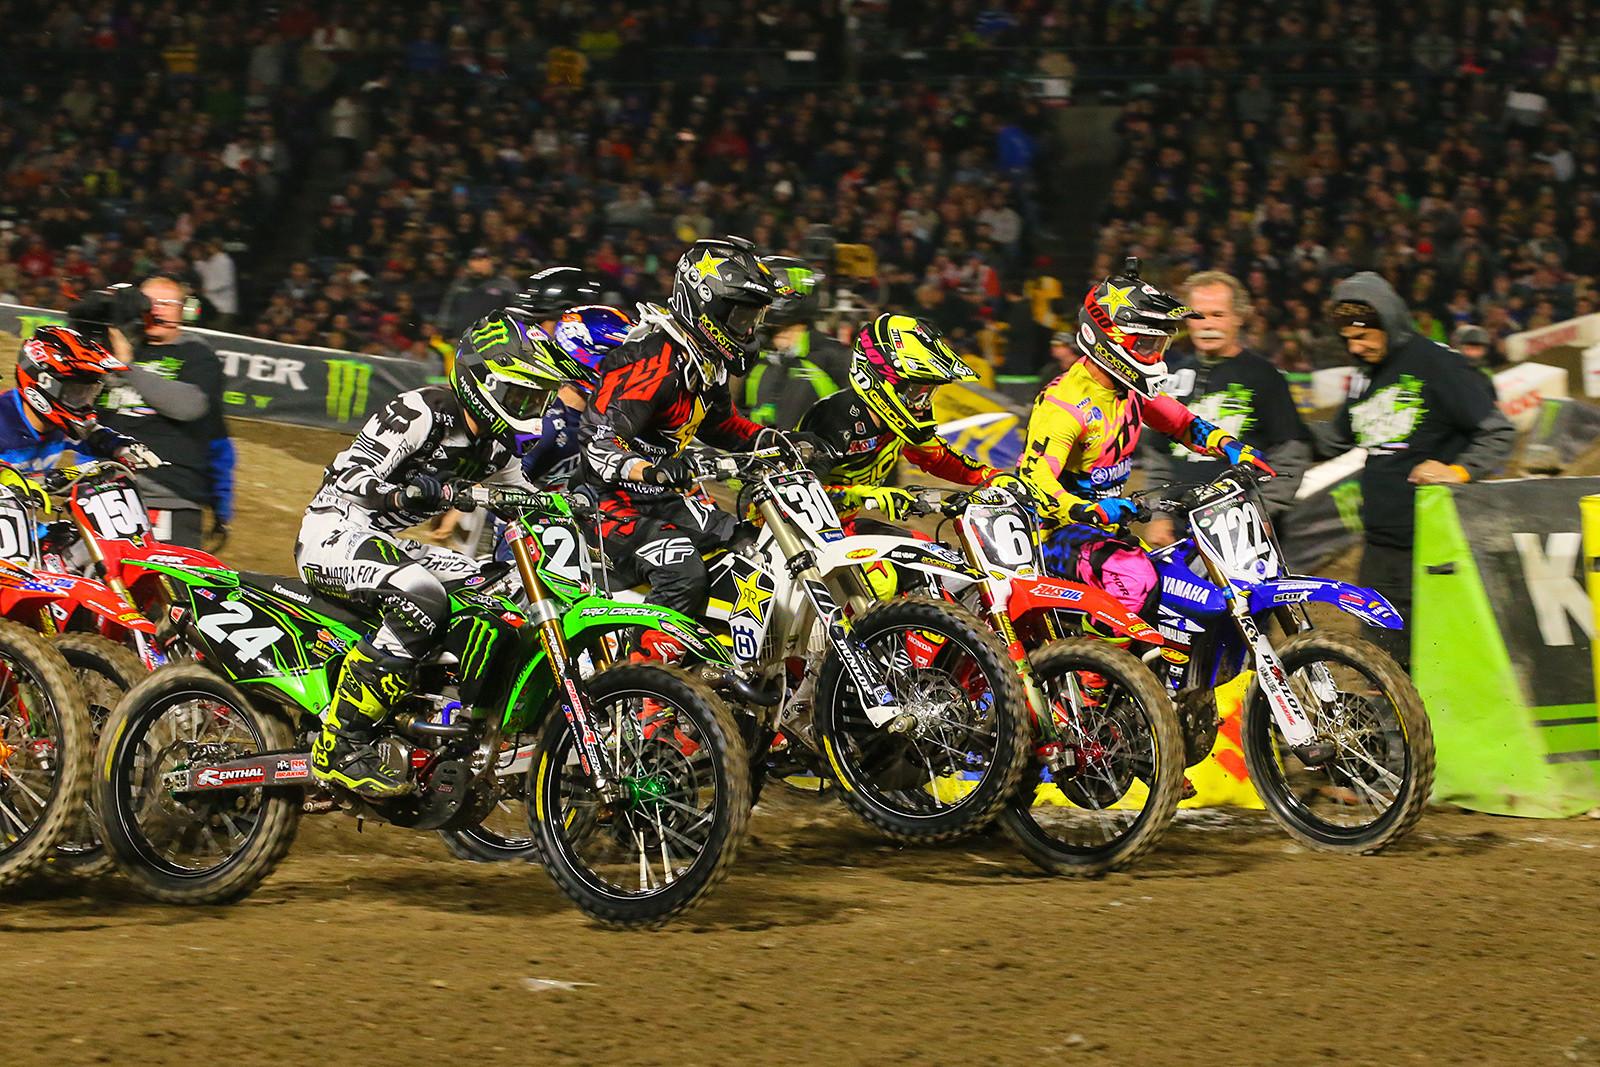 250 Heat Race Two Start - Photo Blast: Anaheim 2 - Motocross Pictures - Vital MX